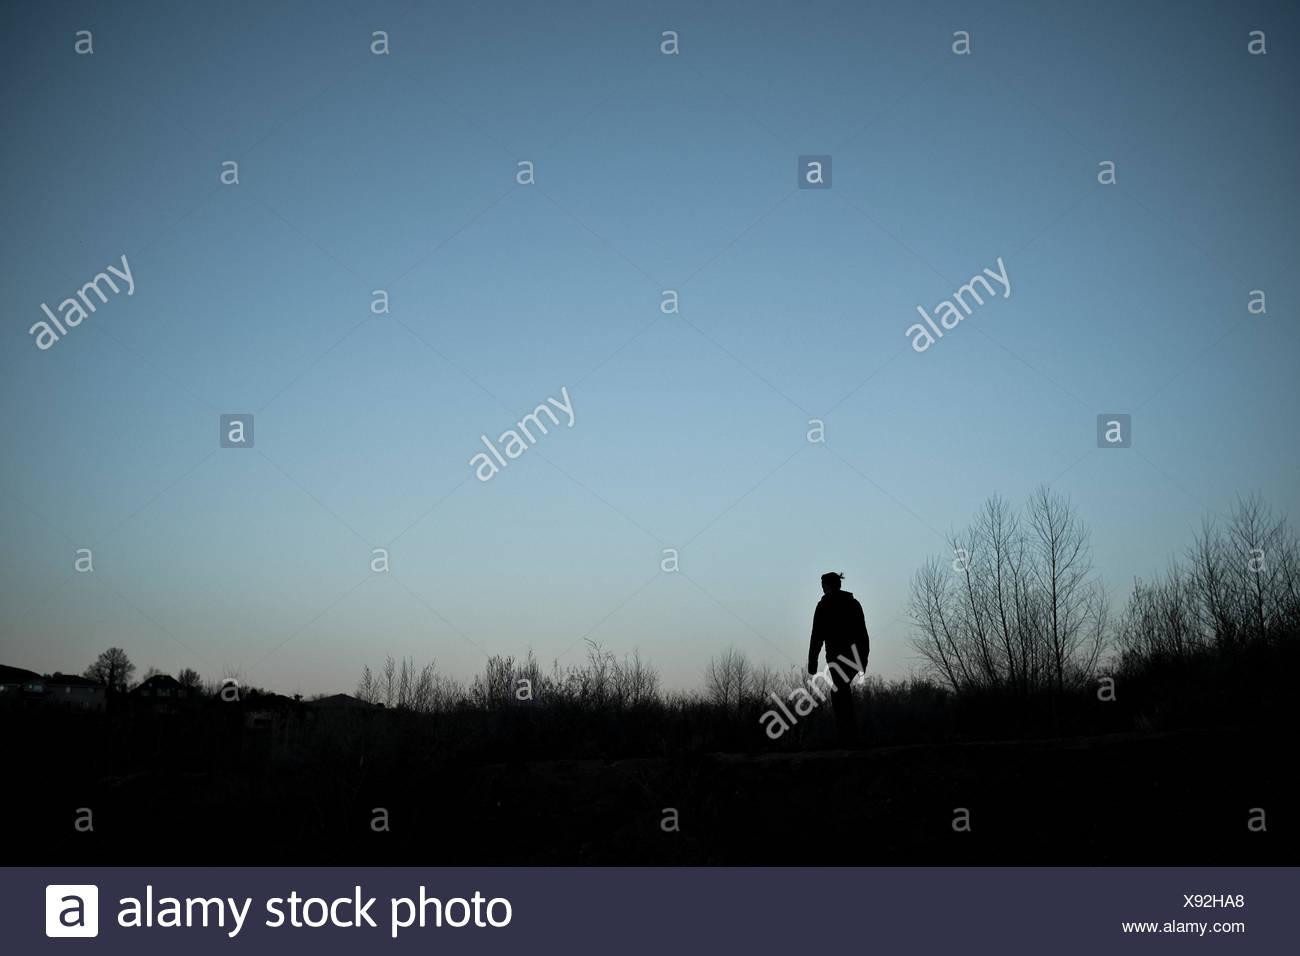 USA, Utah, Silhouette of woman walking at dusk - Stock Image